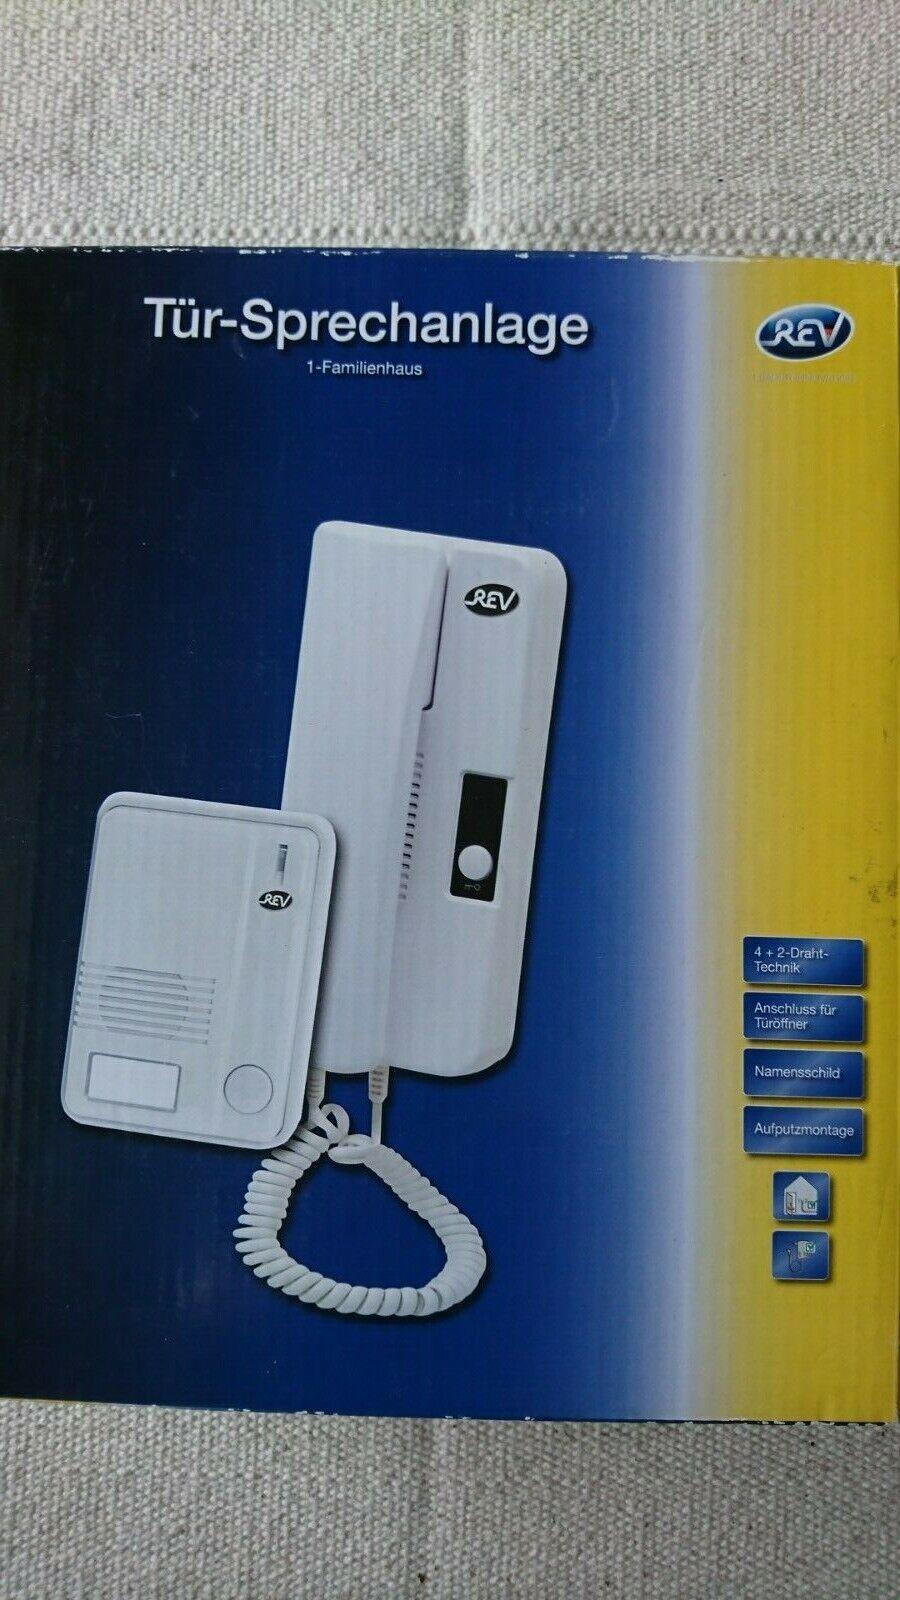 REV Ritter 003003101 1-Fam Sprechanlage Basis